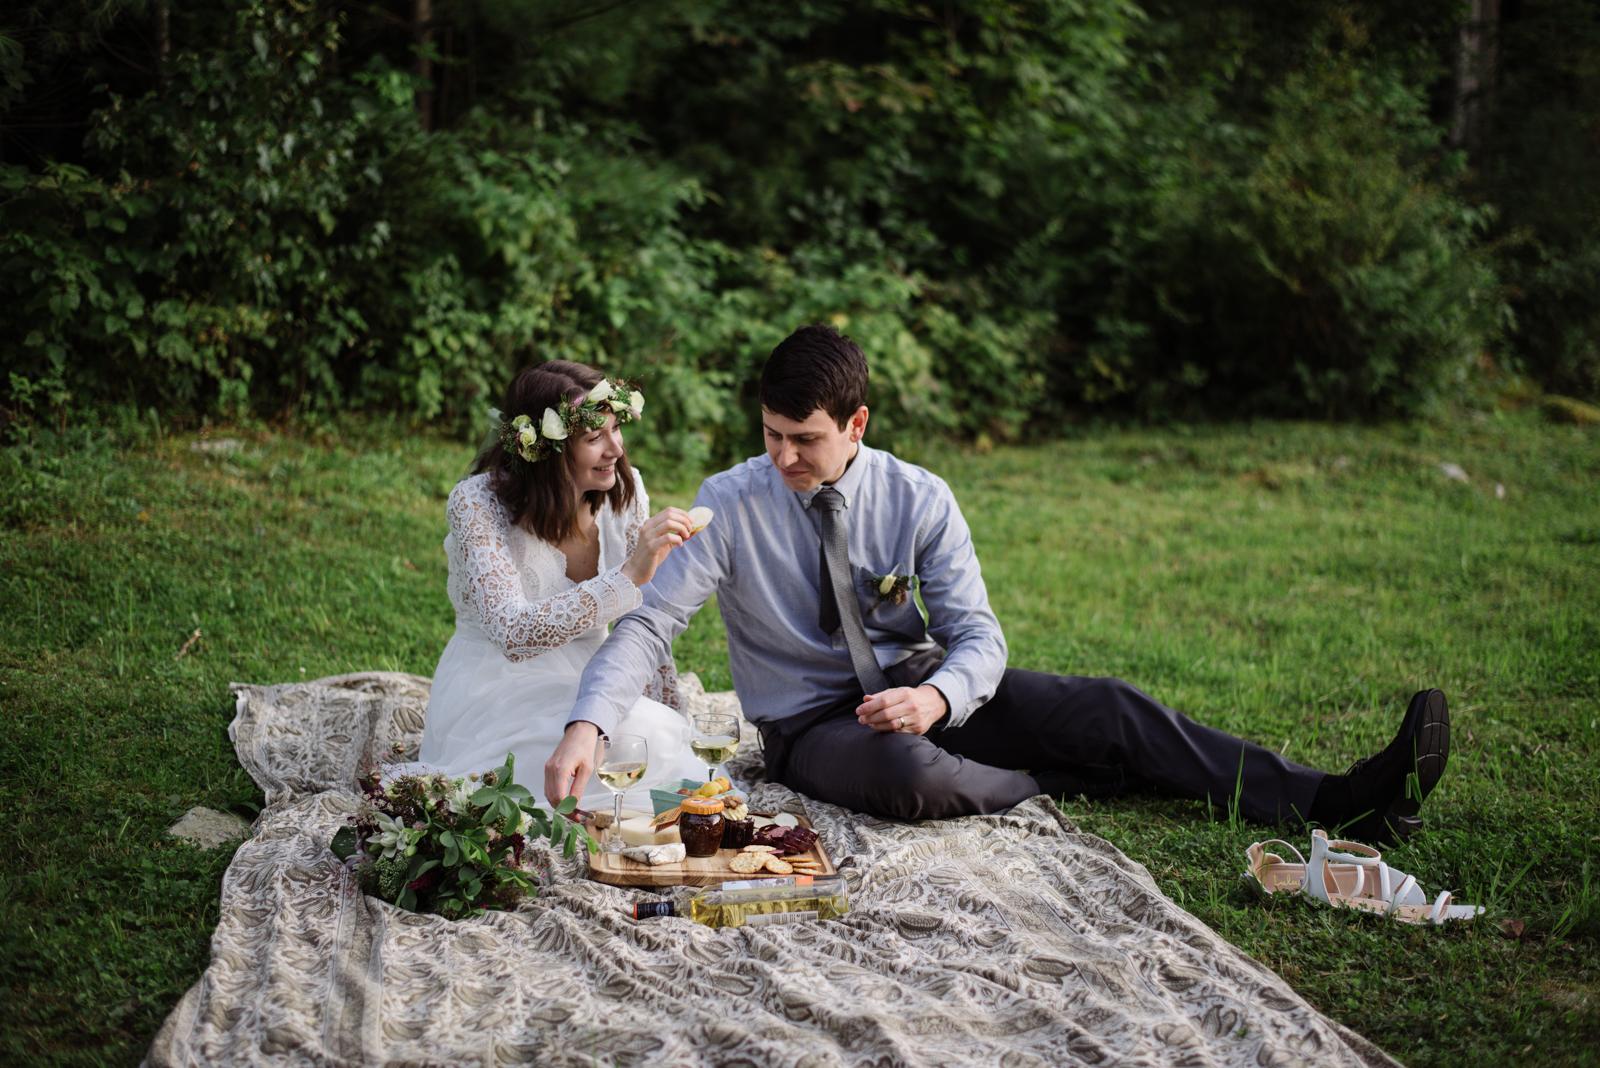 08192018-JessicaJordan-JuliaLuckettPhotography-169.jpg